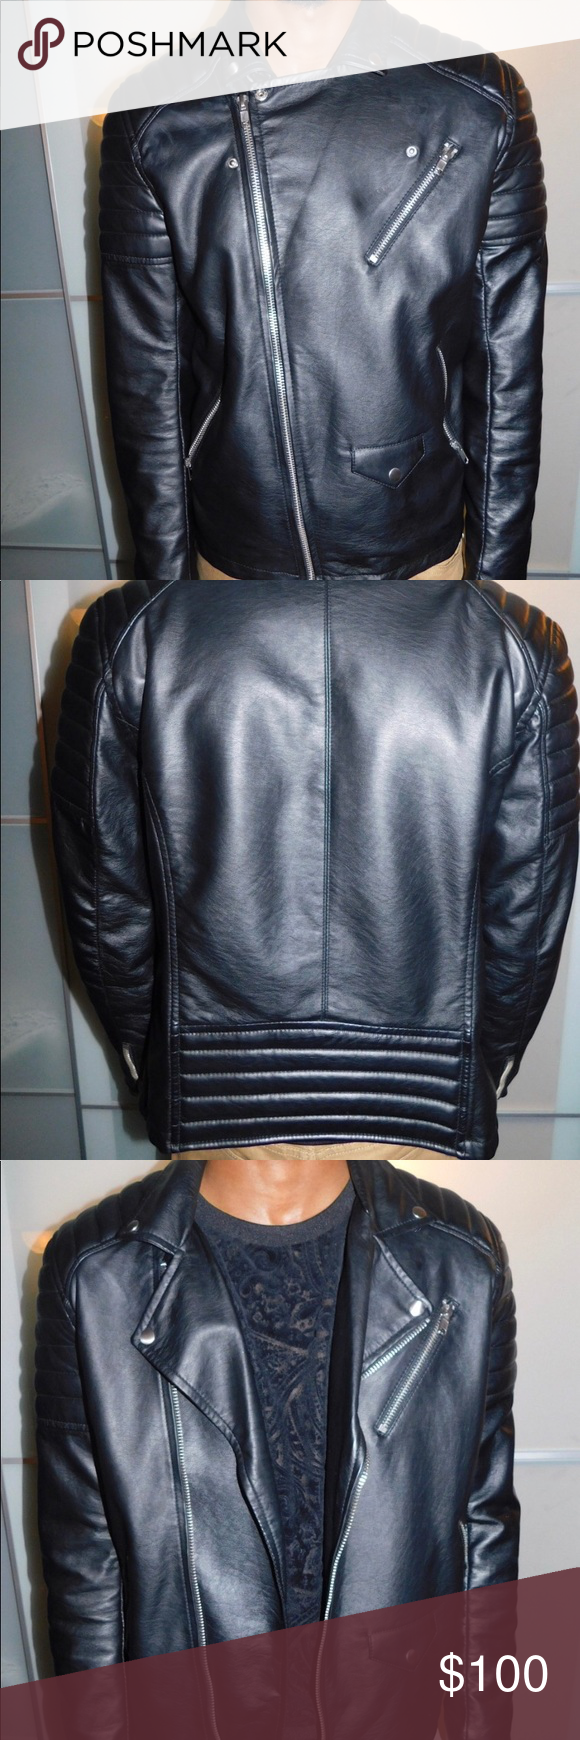 Sporty H&M Men's Leather Jacket size L 👌🏾 Leather jacket